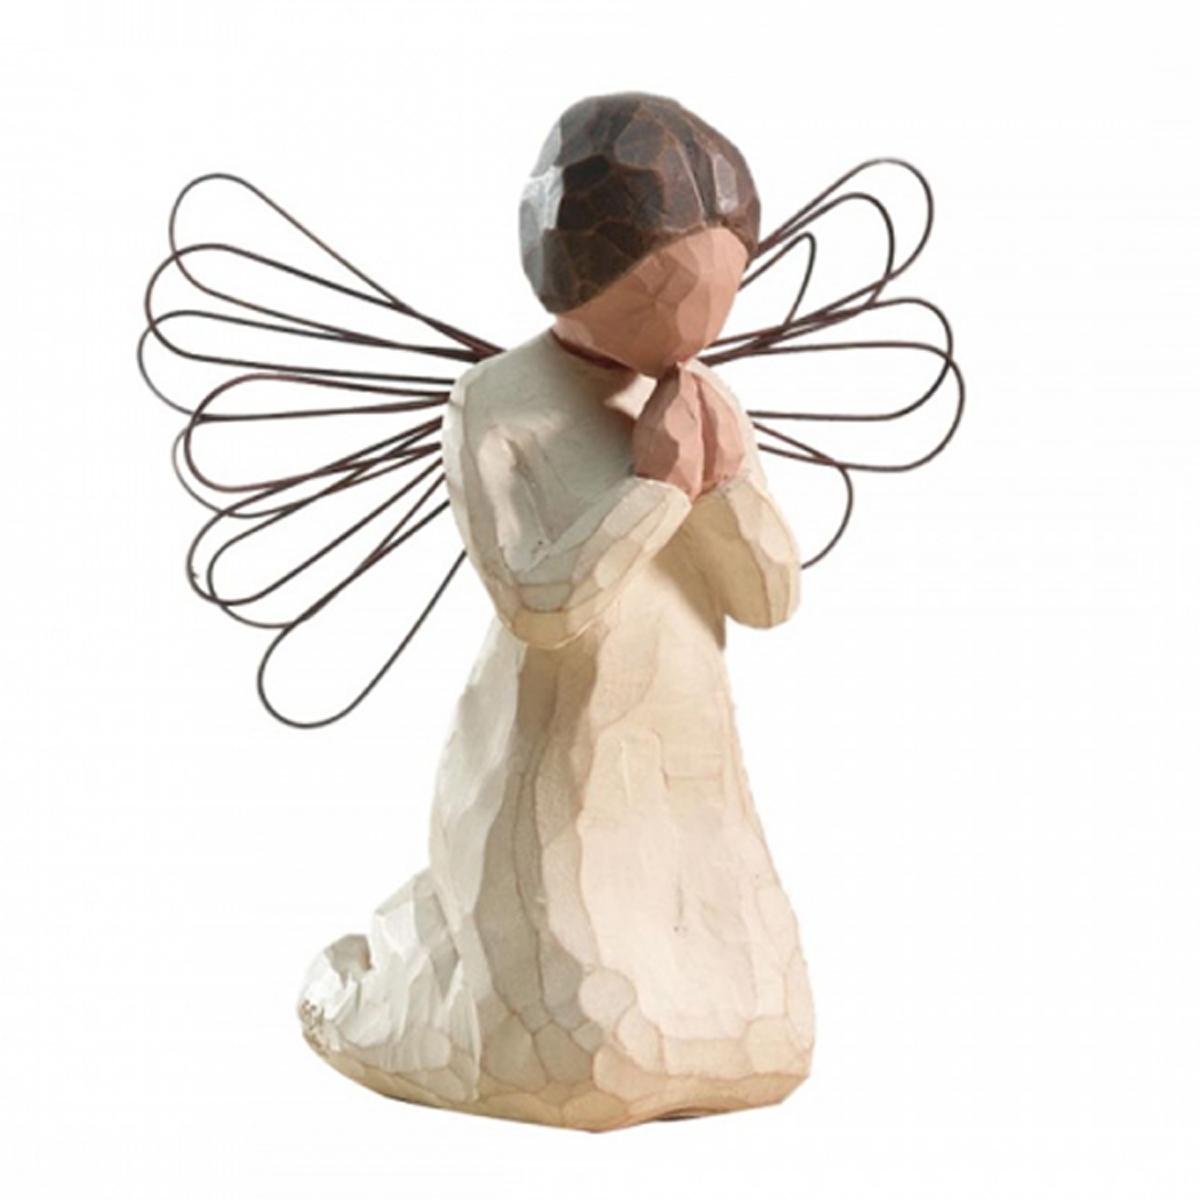 Figurine résine \'Willow Tree\' (ange gardien - prière) - 105x85x65 cm - [R2987]